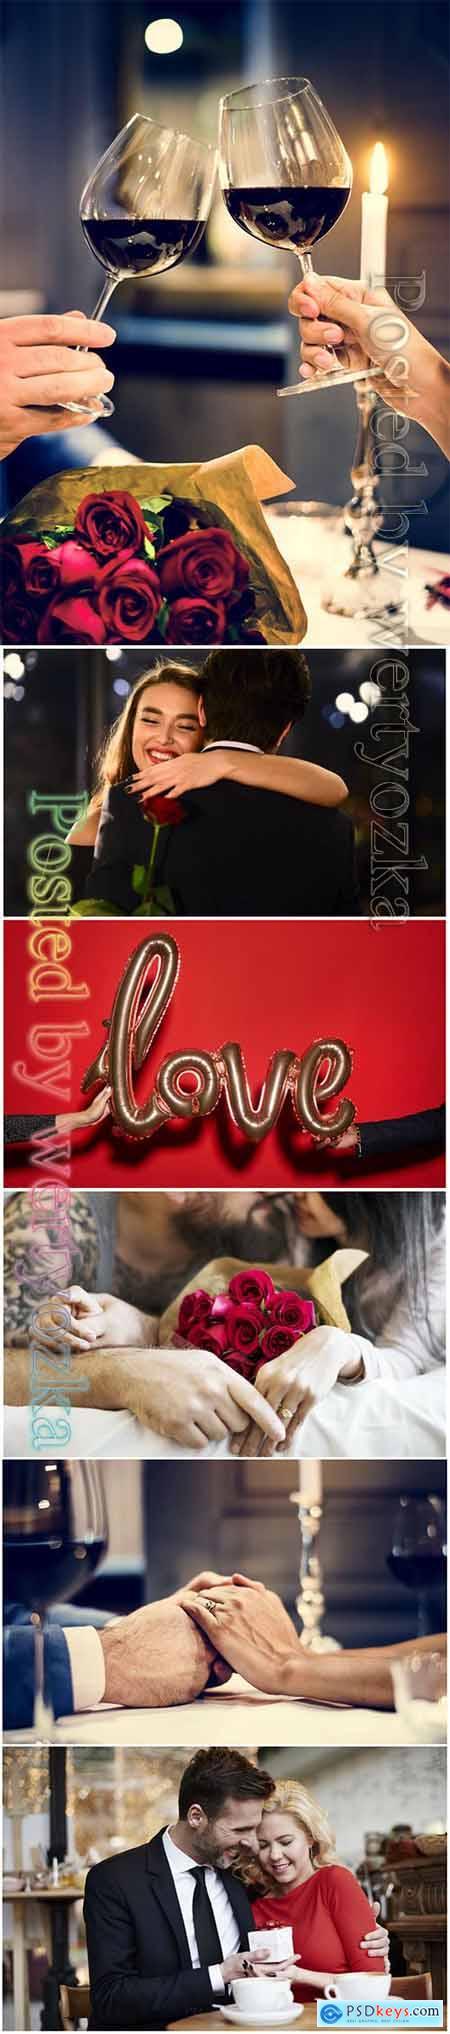 Loving couples beautiful stock photo